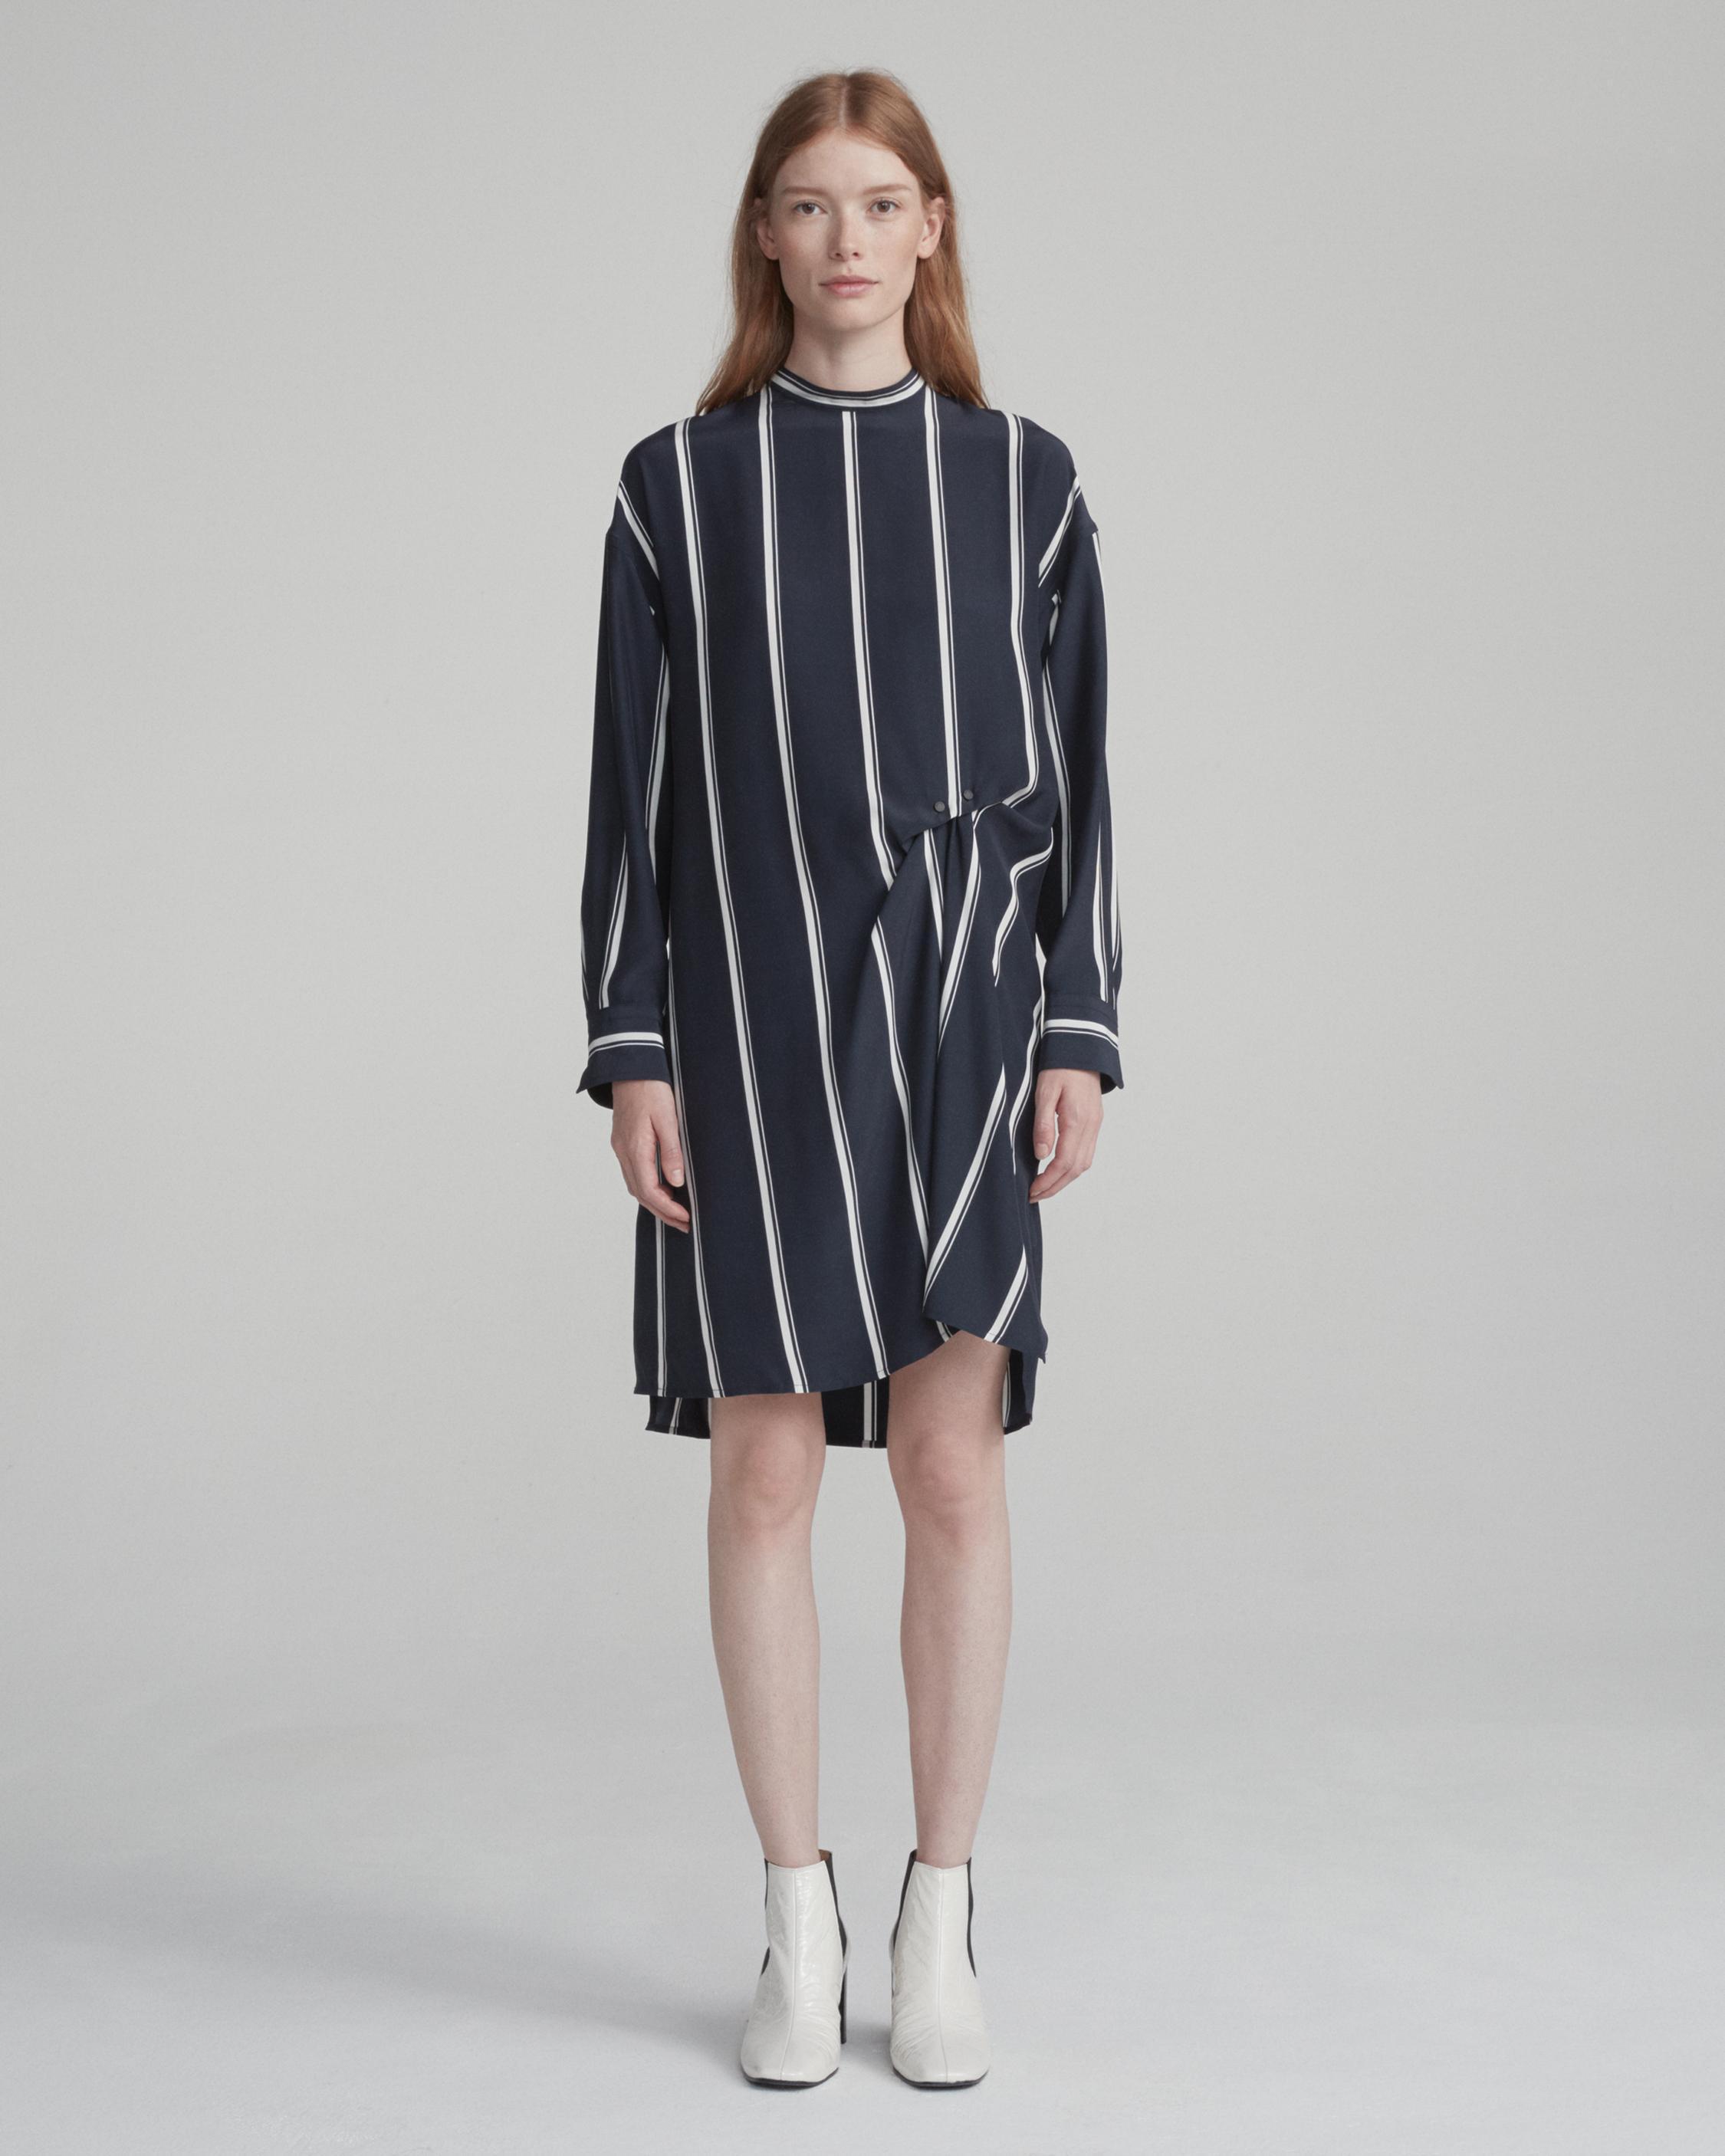 cff874a8b1d Lyst - Rag   Bone Jacklin Dress in Blue - Save 89%